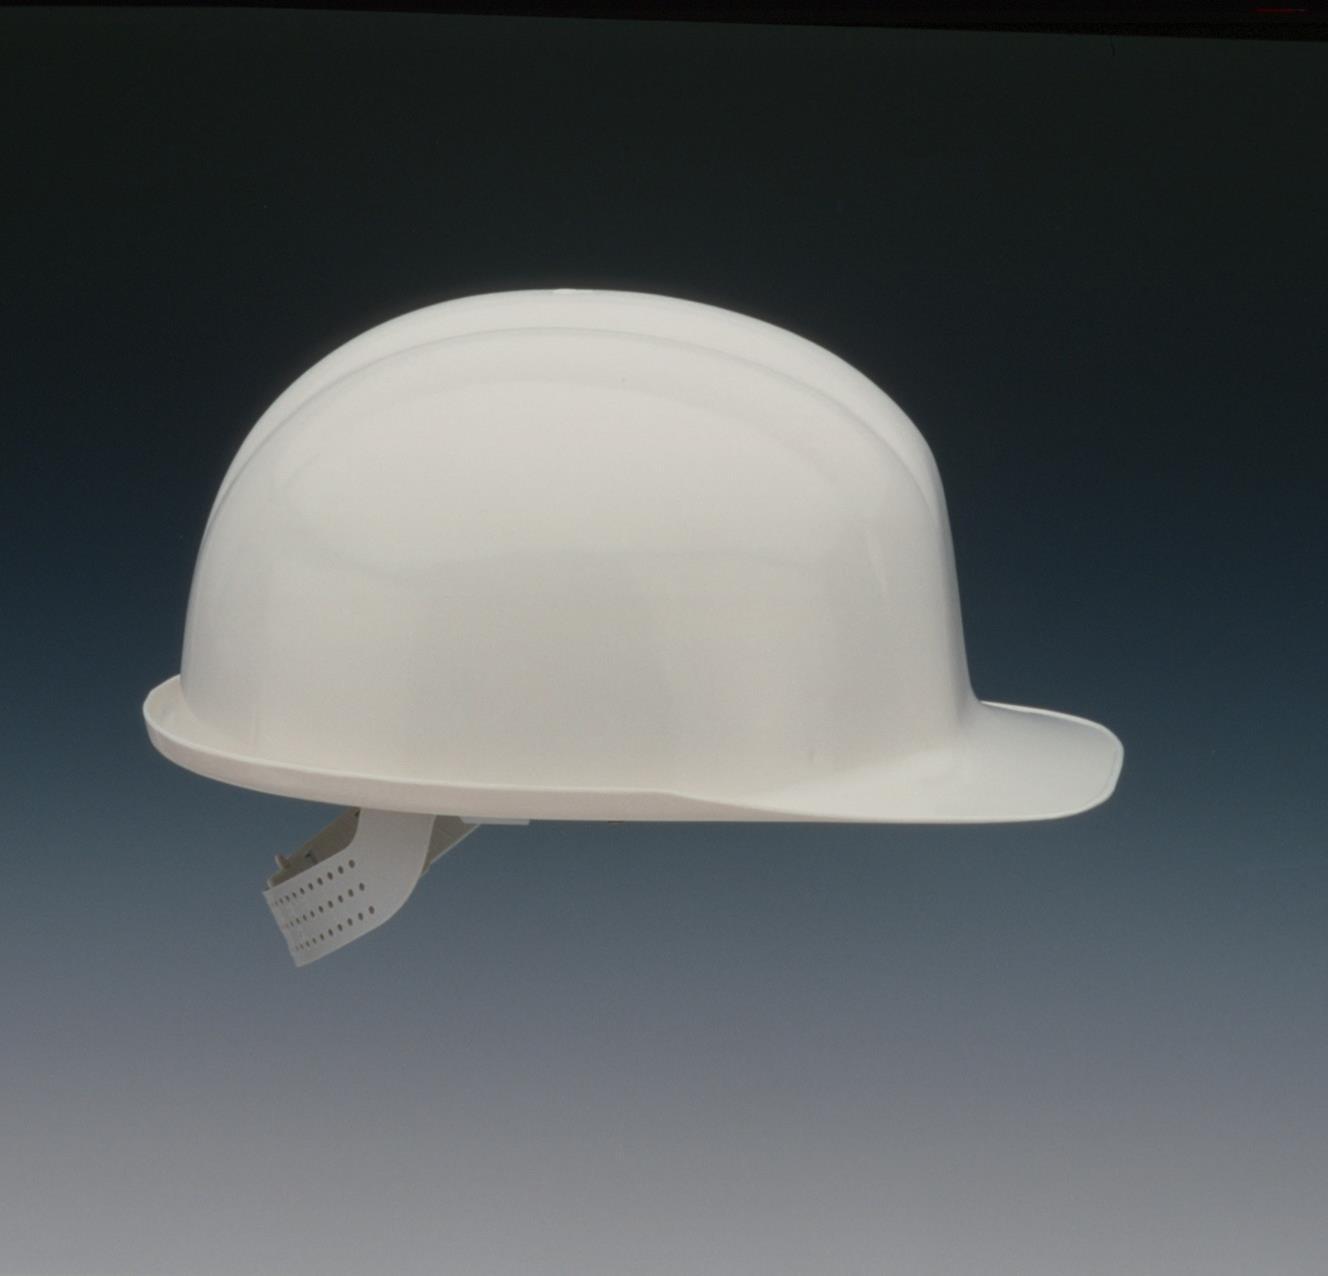 Voss Inap-PCG veiligheidshelm